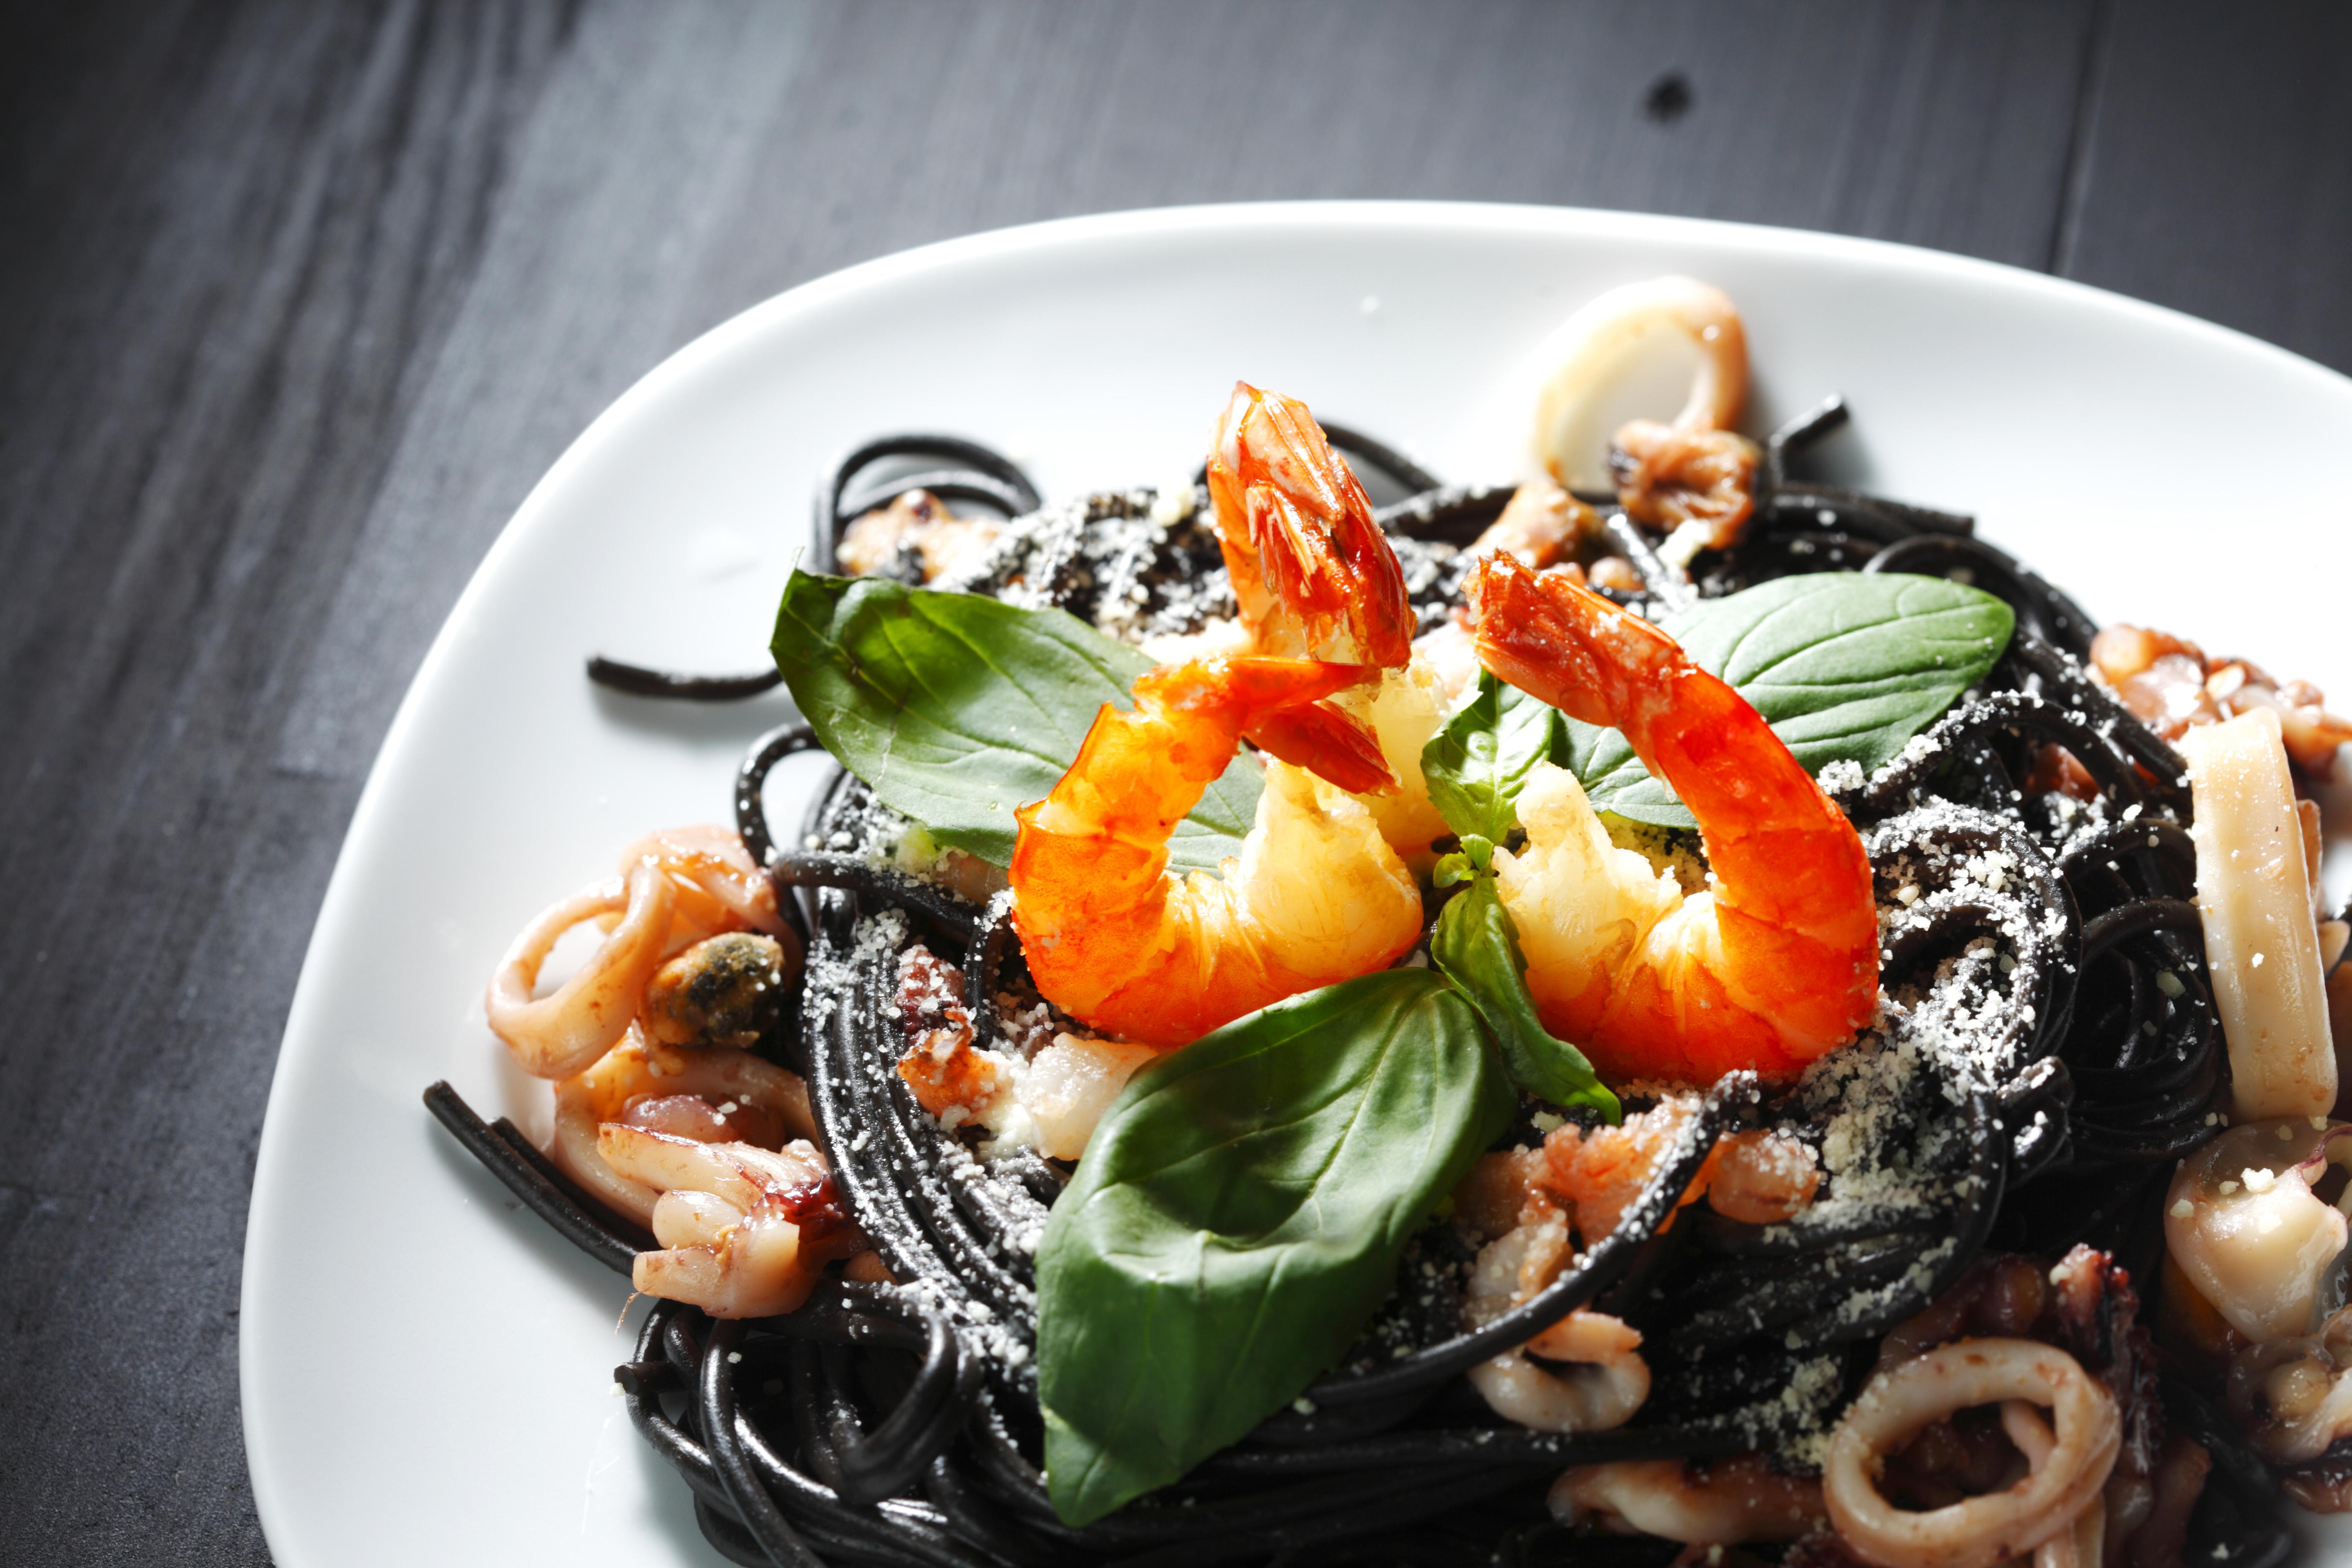 Pasta negra con marisco